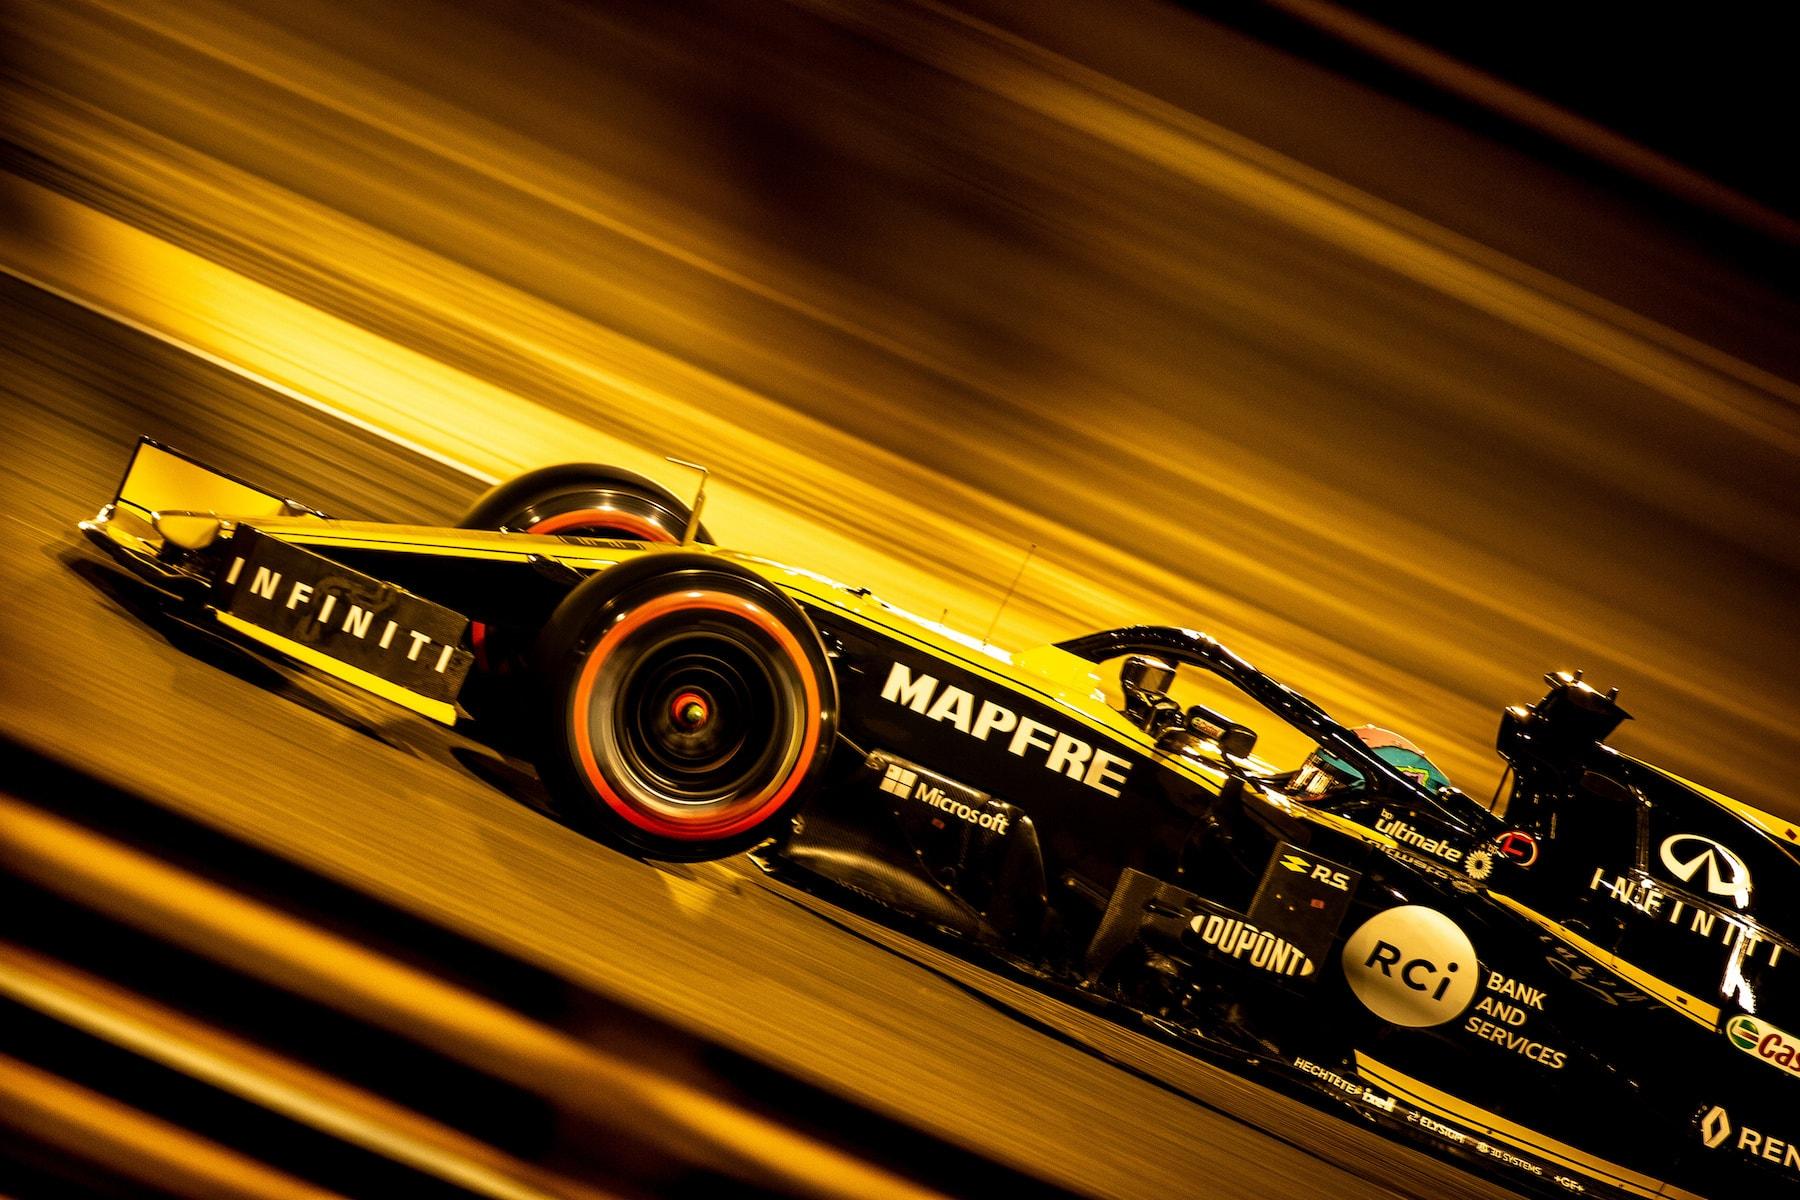 3 4 6 2019 Daniel Ricciardo | Renault RS19 | 2019 Bahrain GP DNF 1 copy.jpg